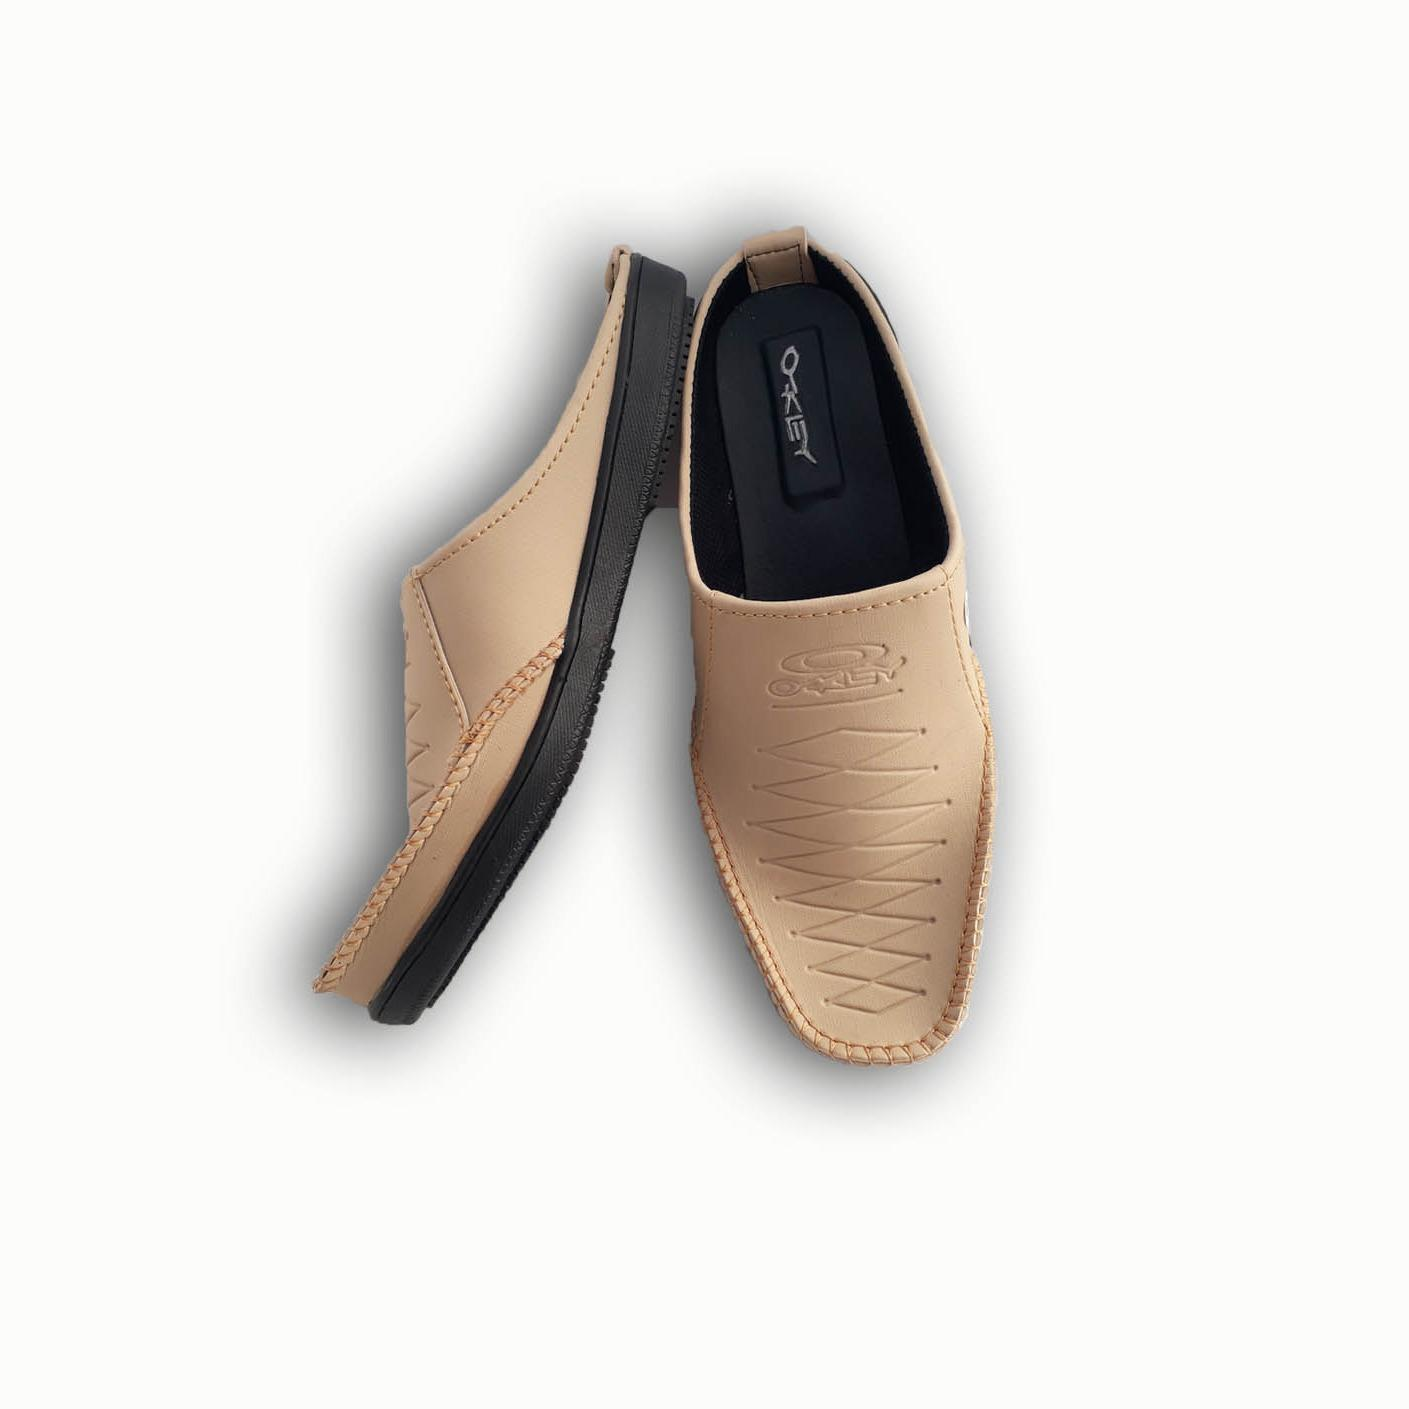 Arjun4 Sepatu Sandal Selop Kulit Sintetis KWL - Sepatu Sandal Pantofel Pria - Sandal Pria Slop - Krem